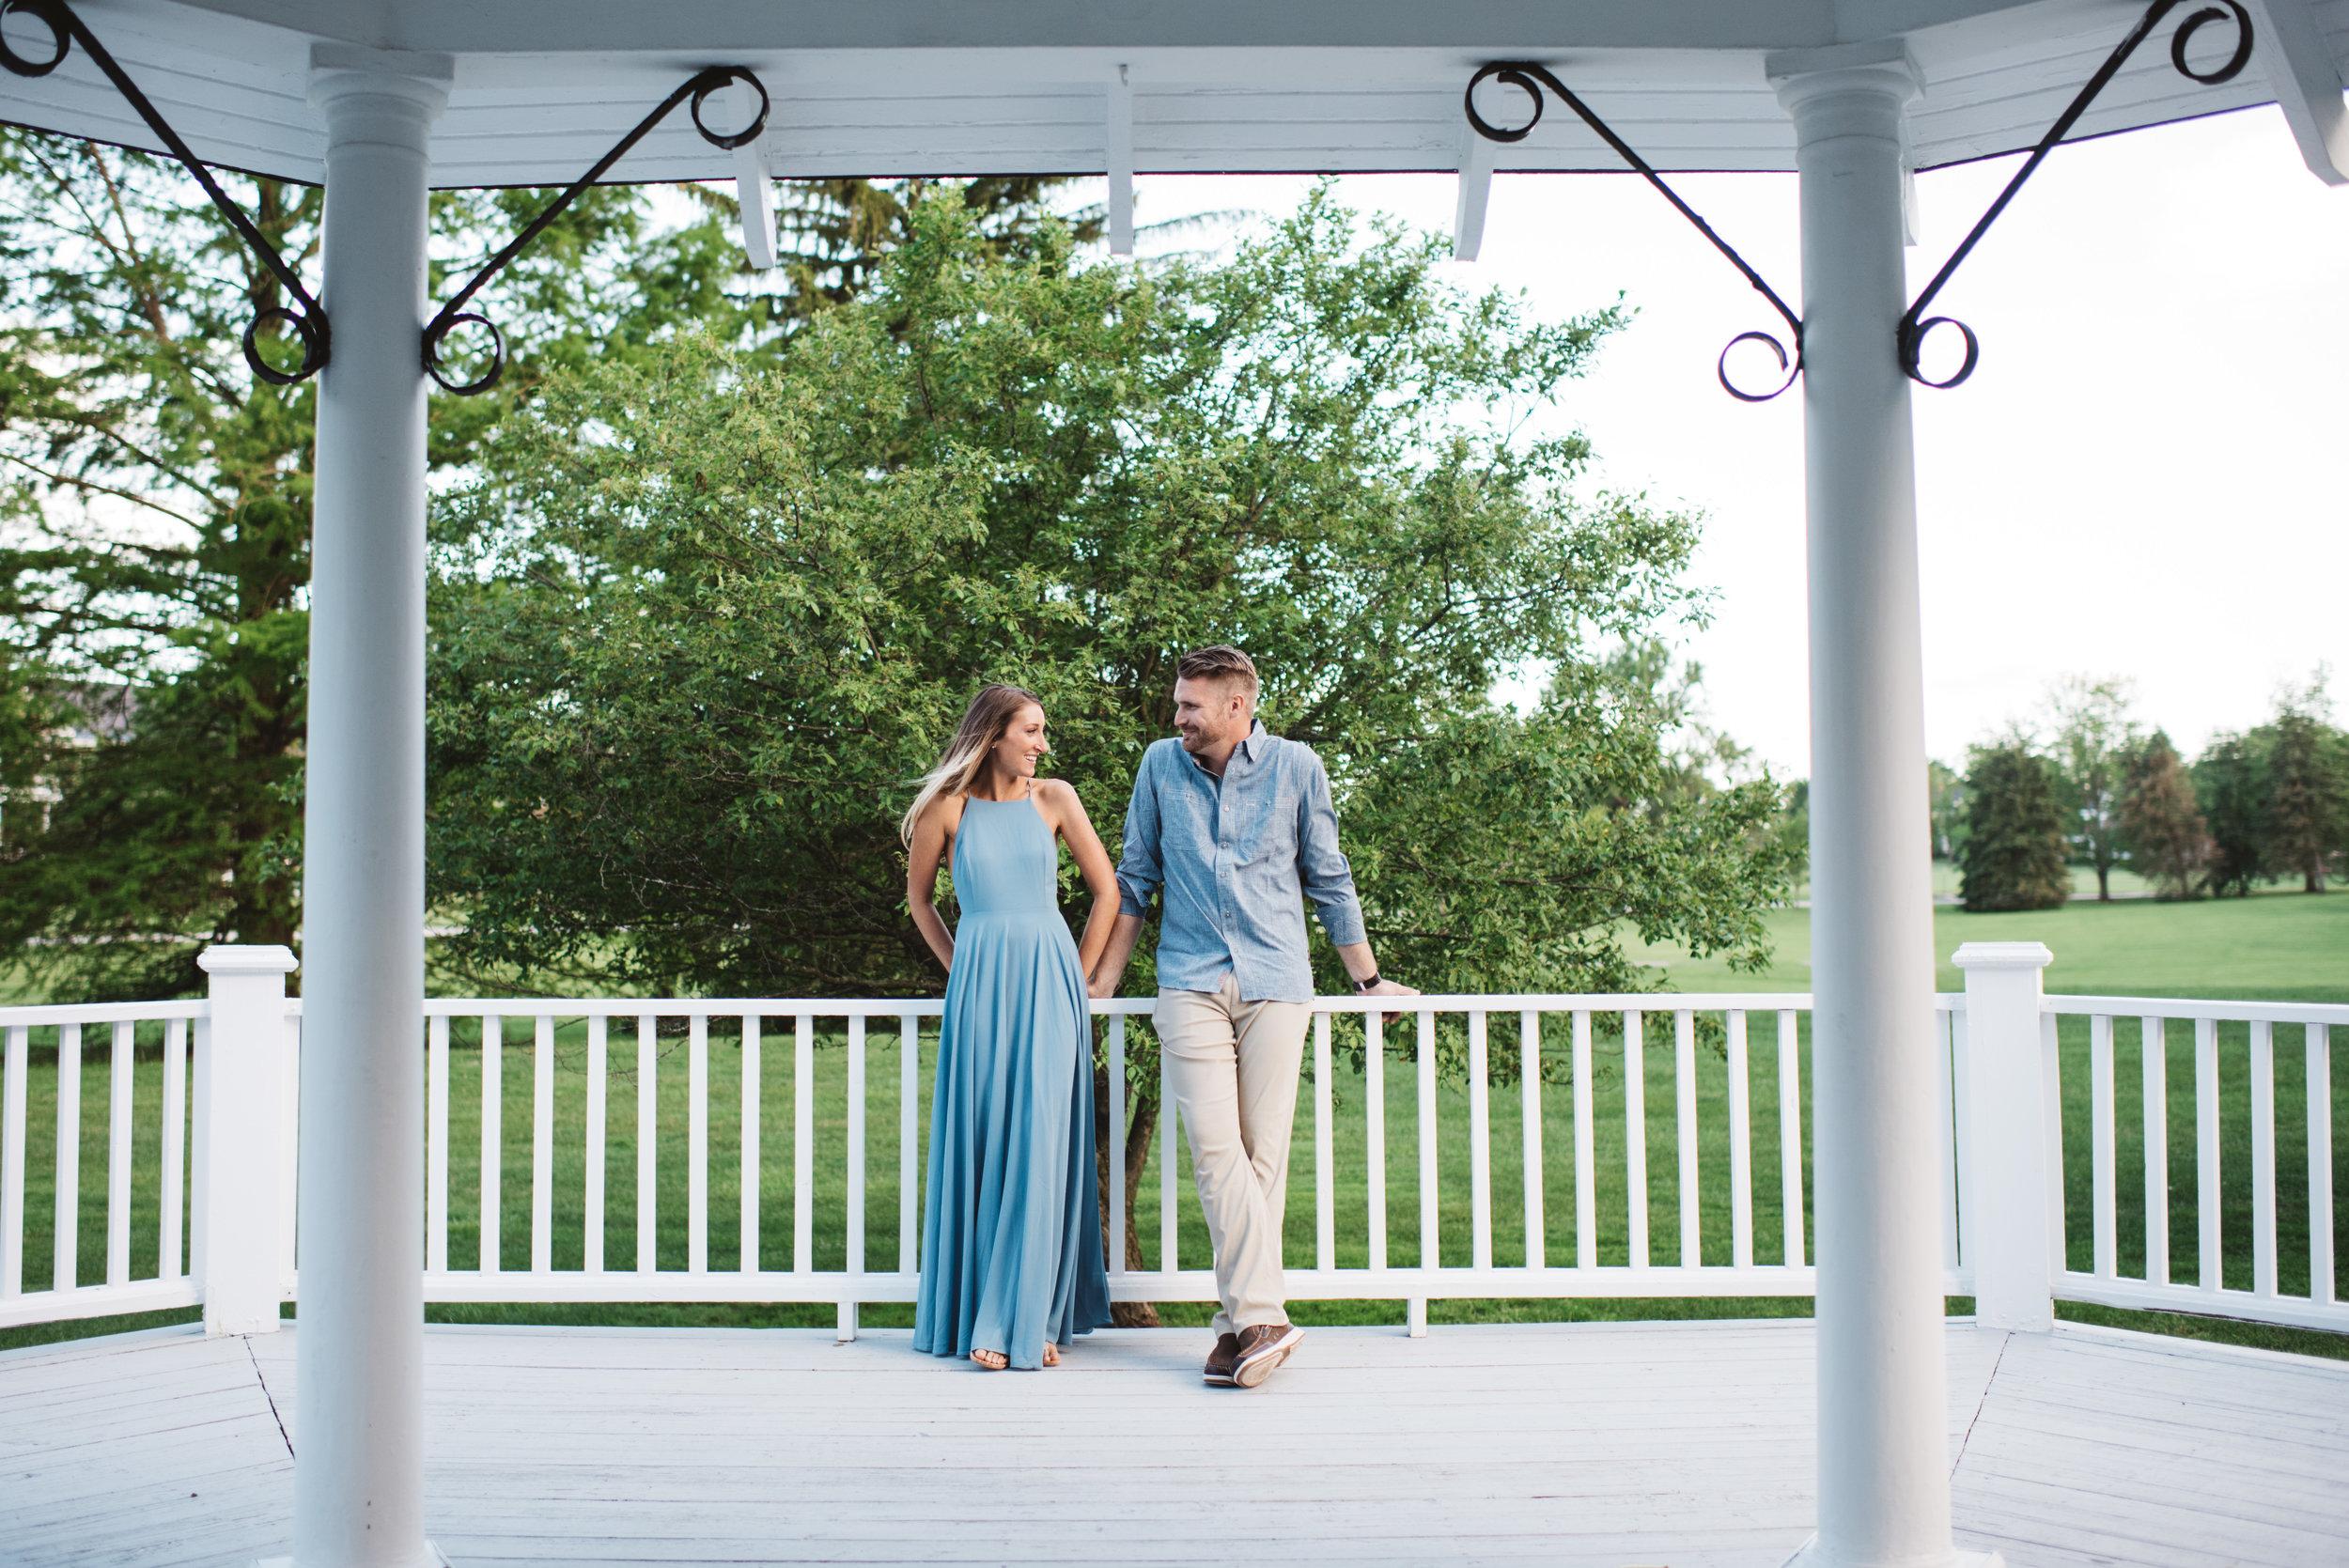 Erika Aileen Photography Fort Benjamin Harrison Porter Books Engagement Session Indianapolis Wedding Photographer